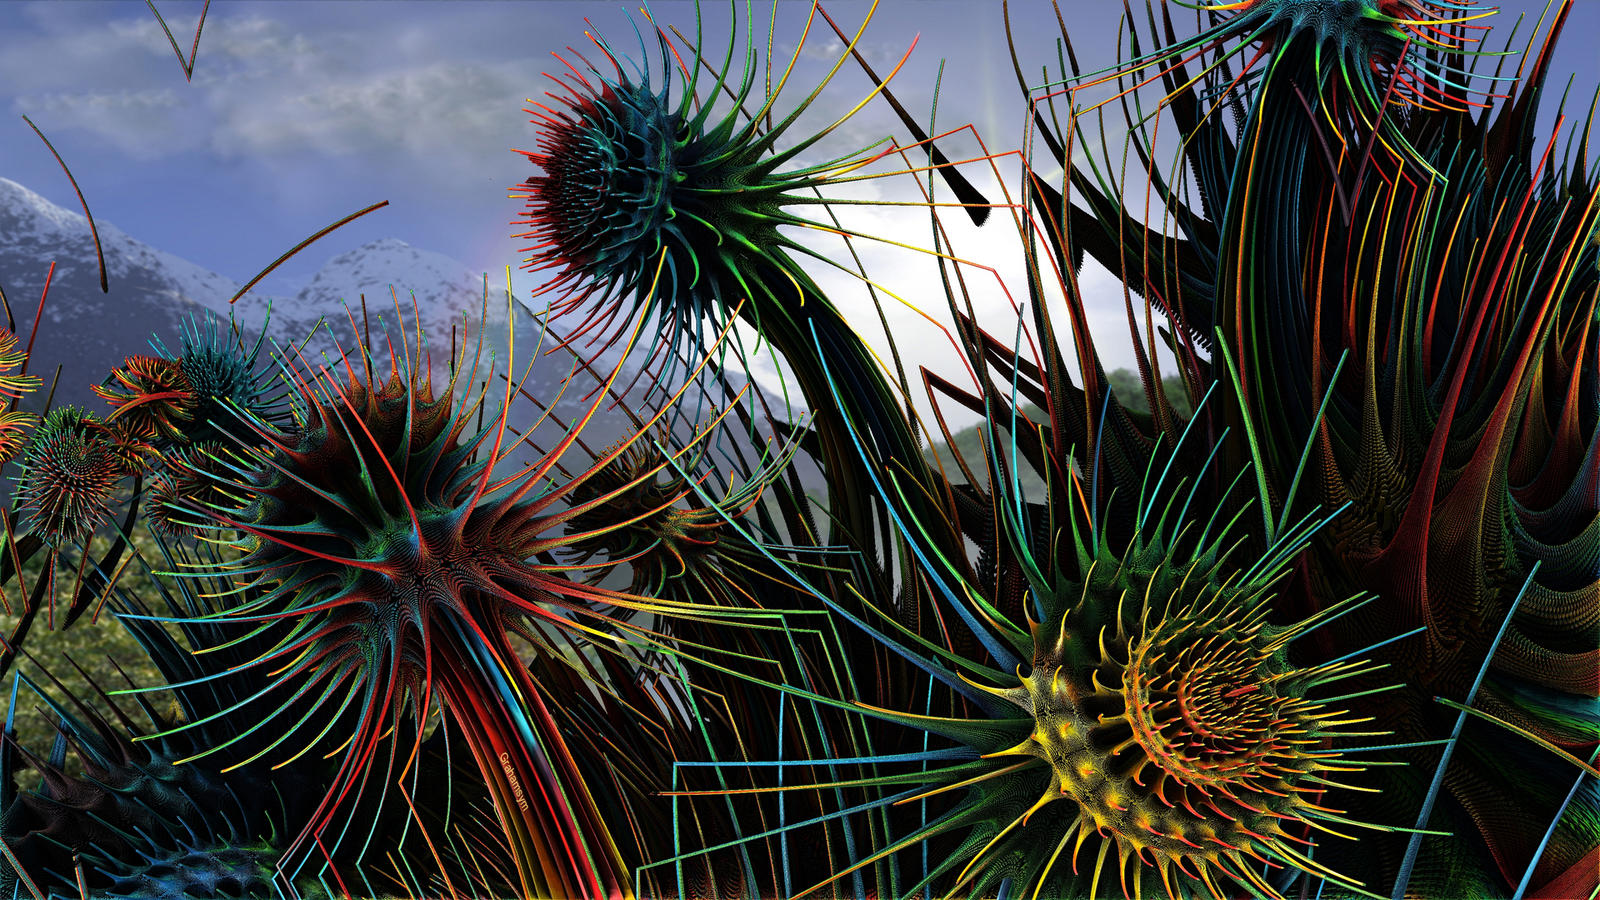 Weeds by GrahamSym